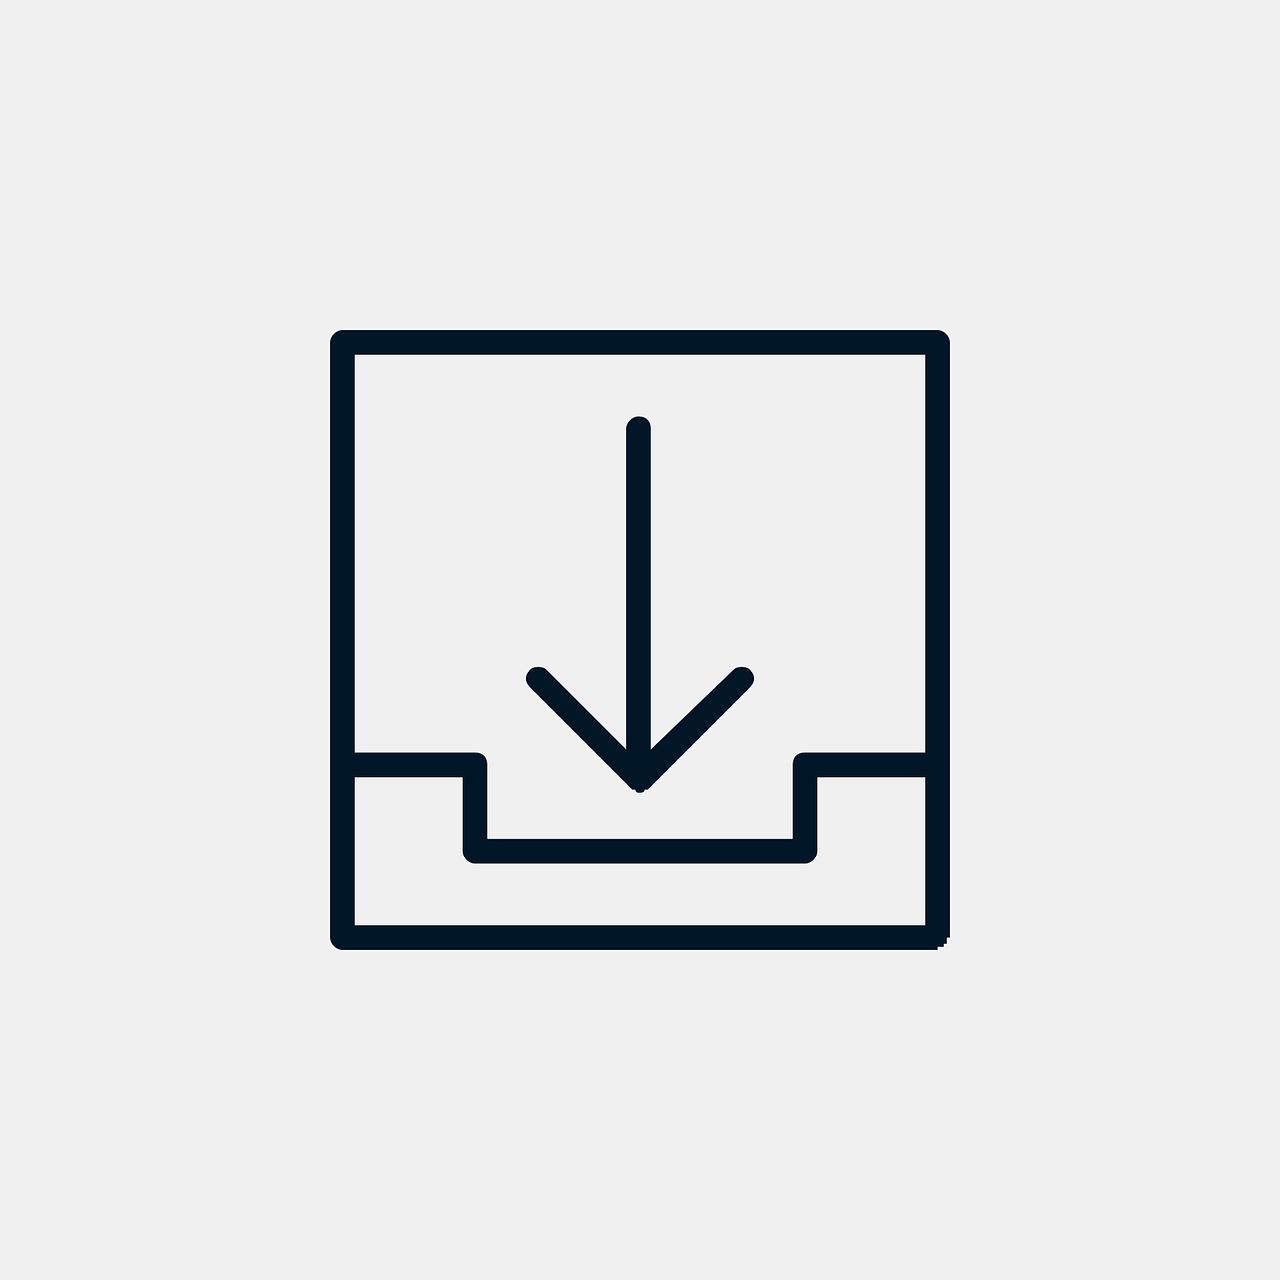 ChromeでTiddlyWikiを保存できない場合の対処方法